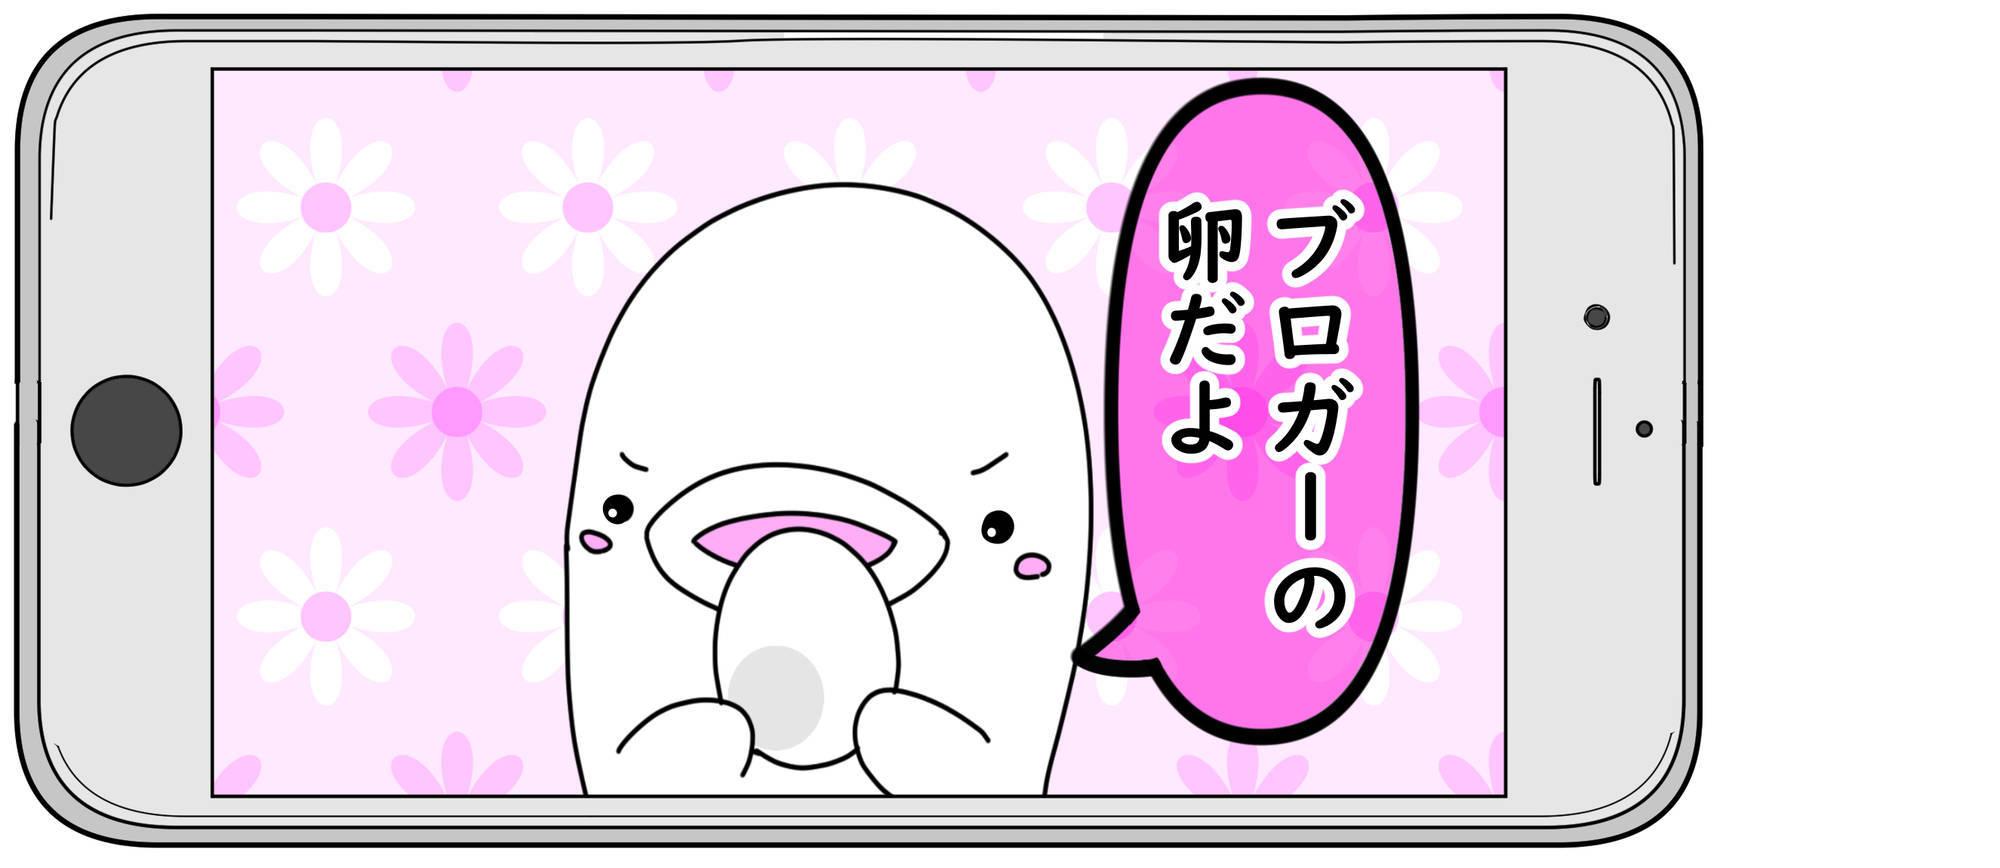 f:id:shiro_iruka:20190509031113j:plain